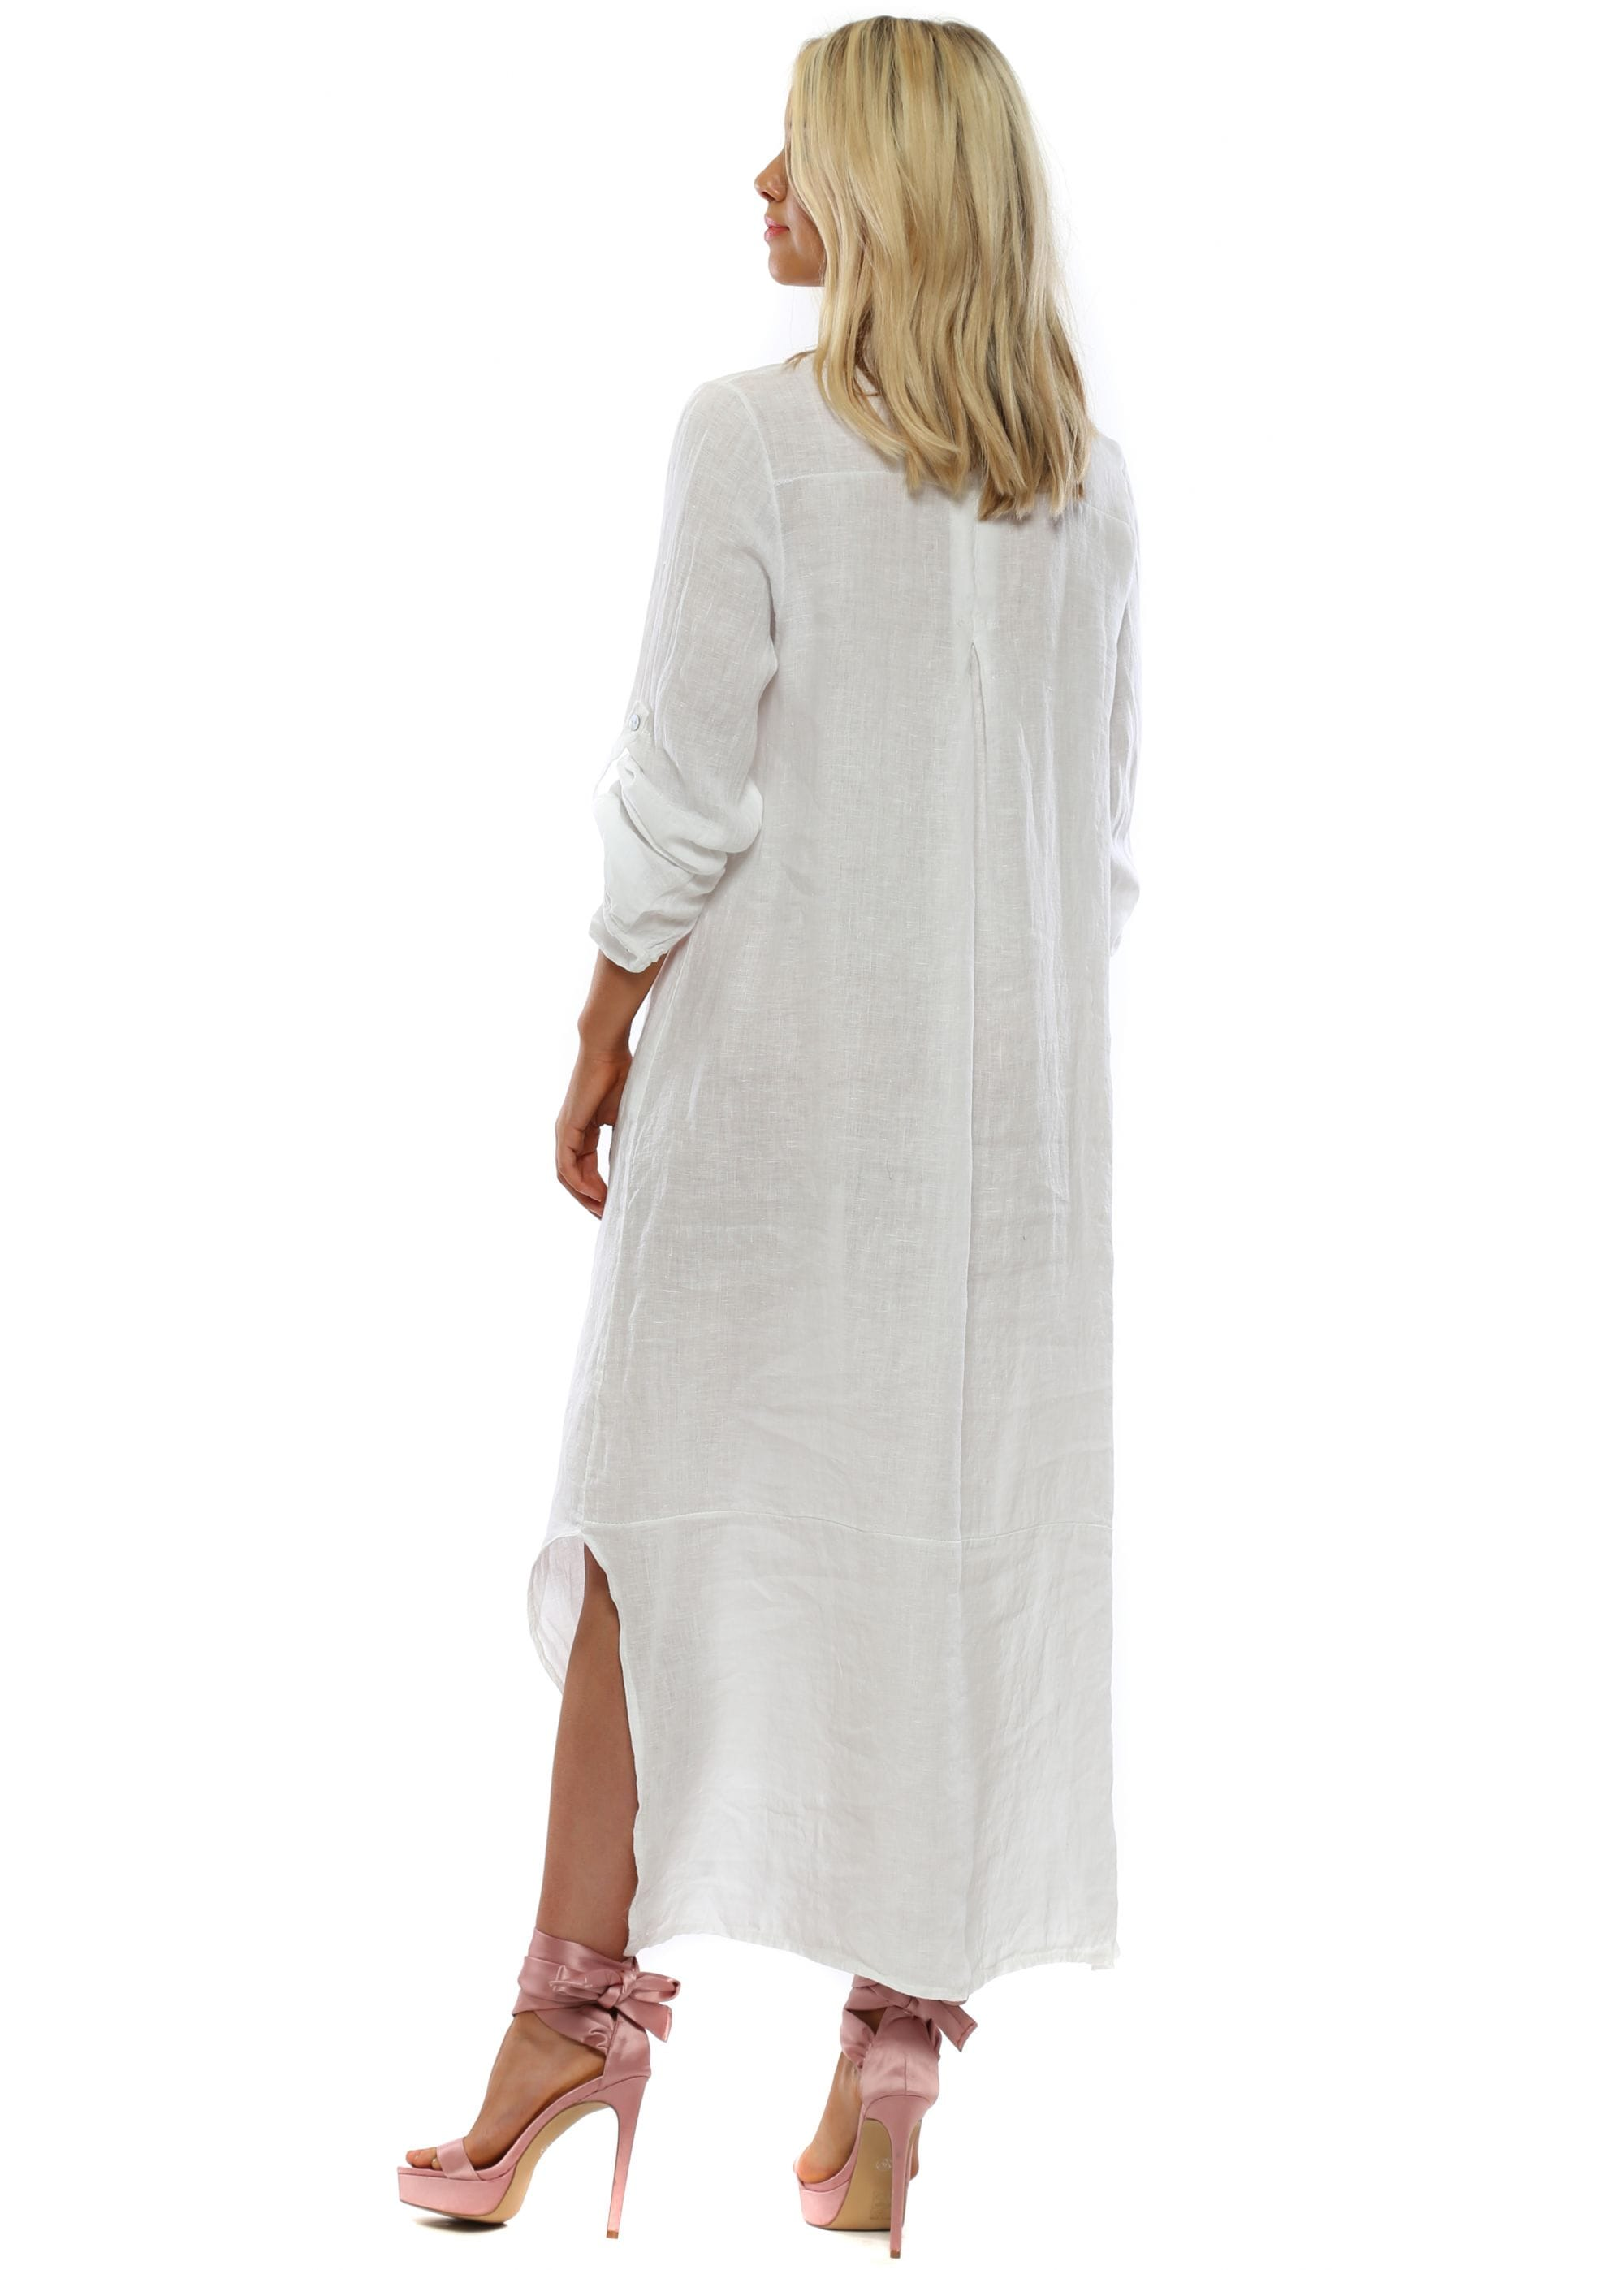 Lea & Luc White Linen Maxi Shirt Dress